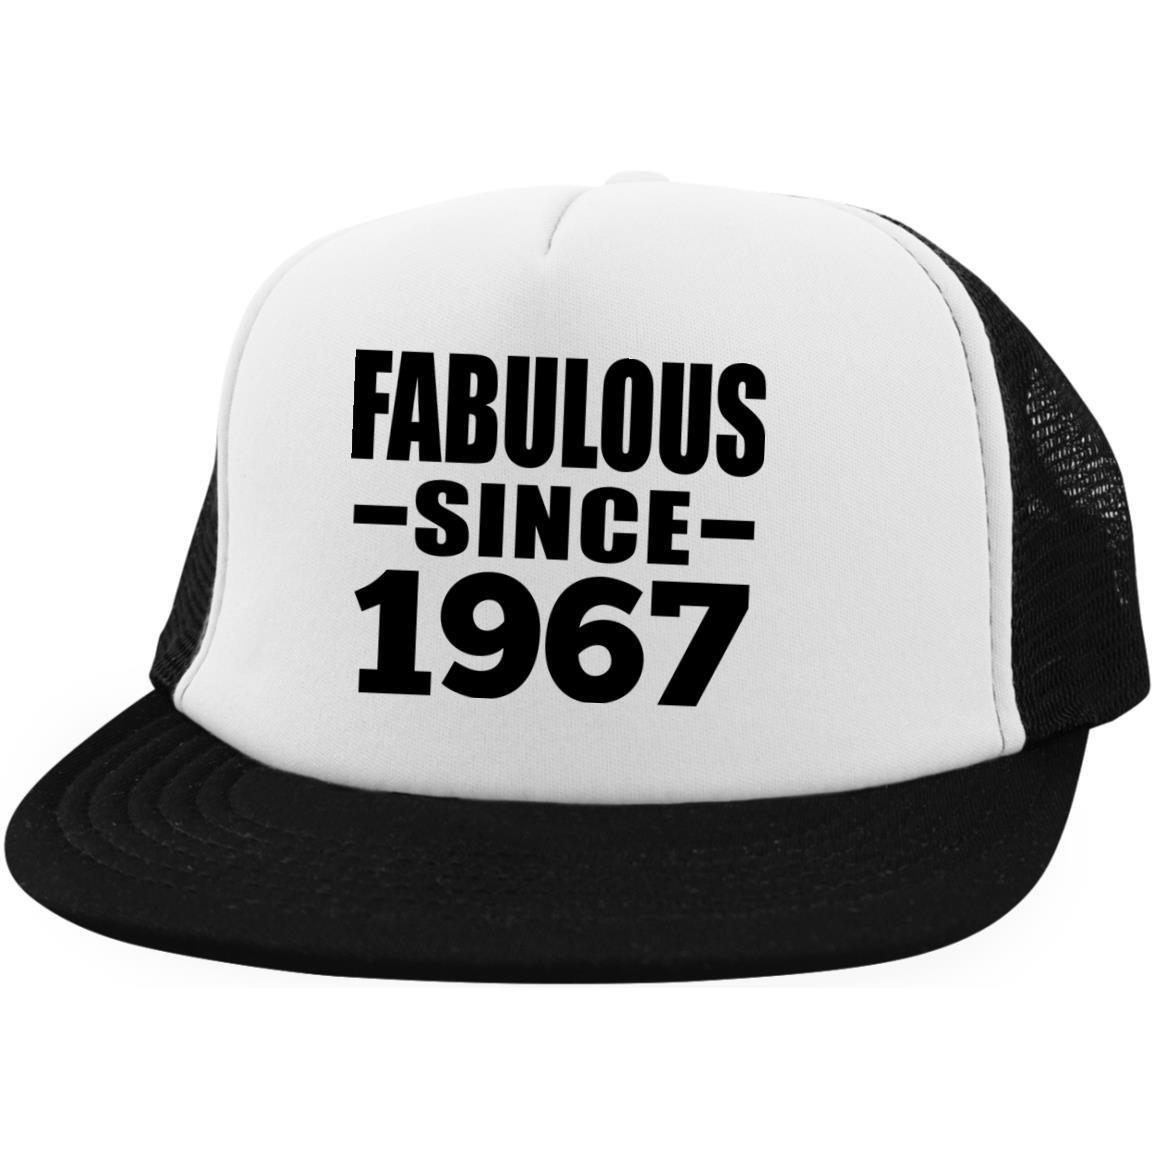 52nd Birthday Fabulous Since 1967 - Trucker Hat Visera ...